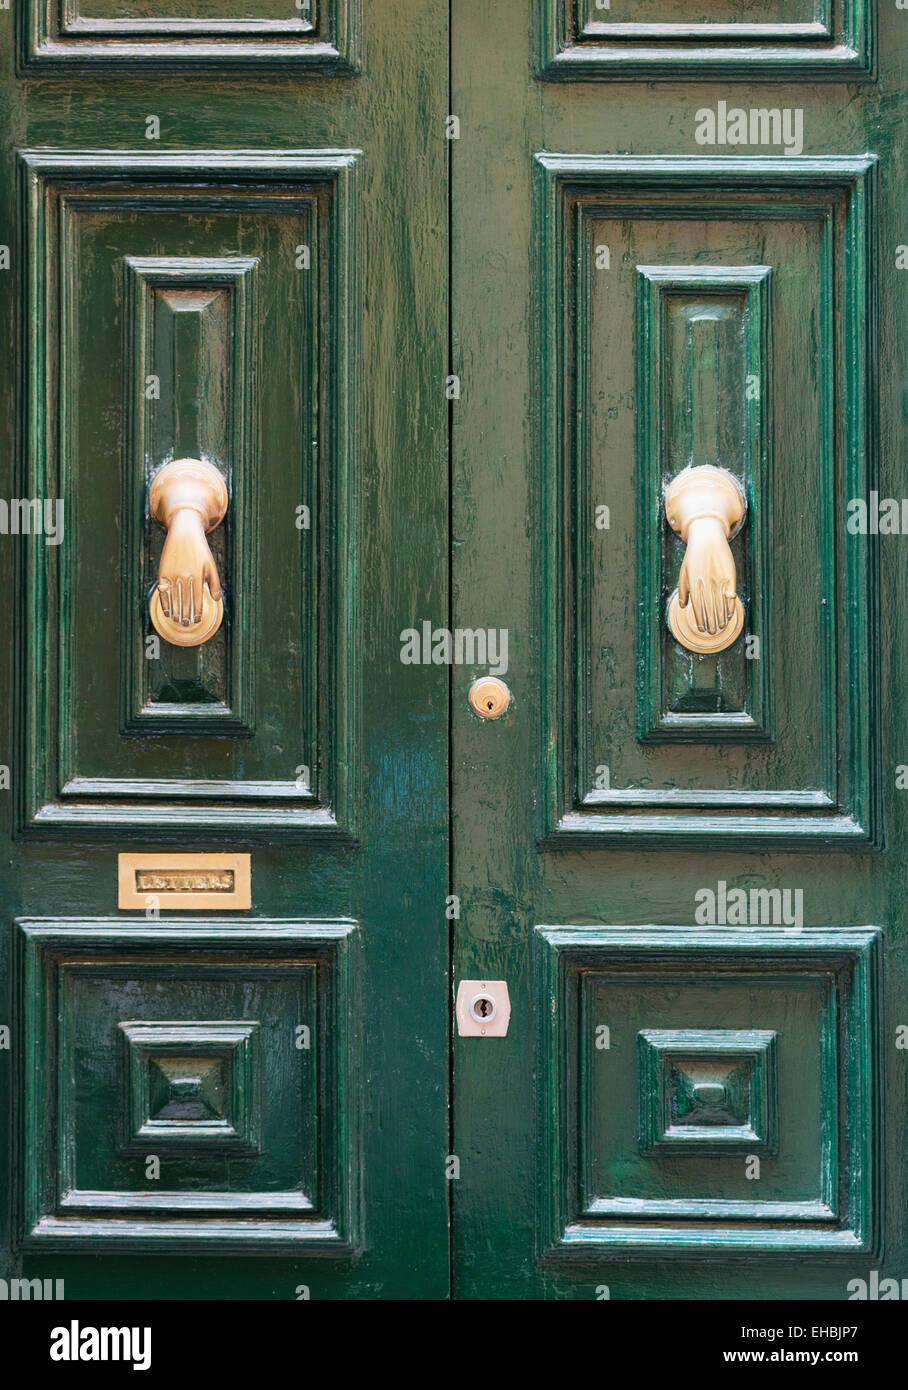 Mediterranean Europe, Malta, Valletta, decorative door knockers - Stock Image